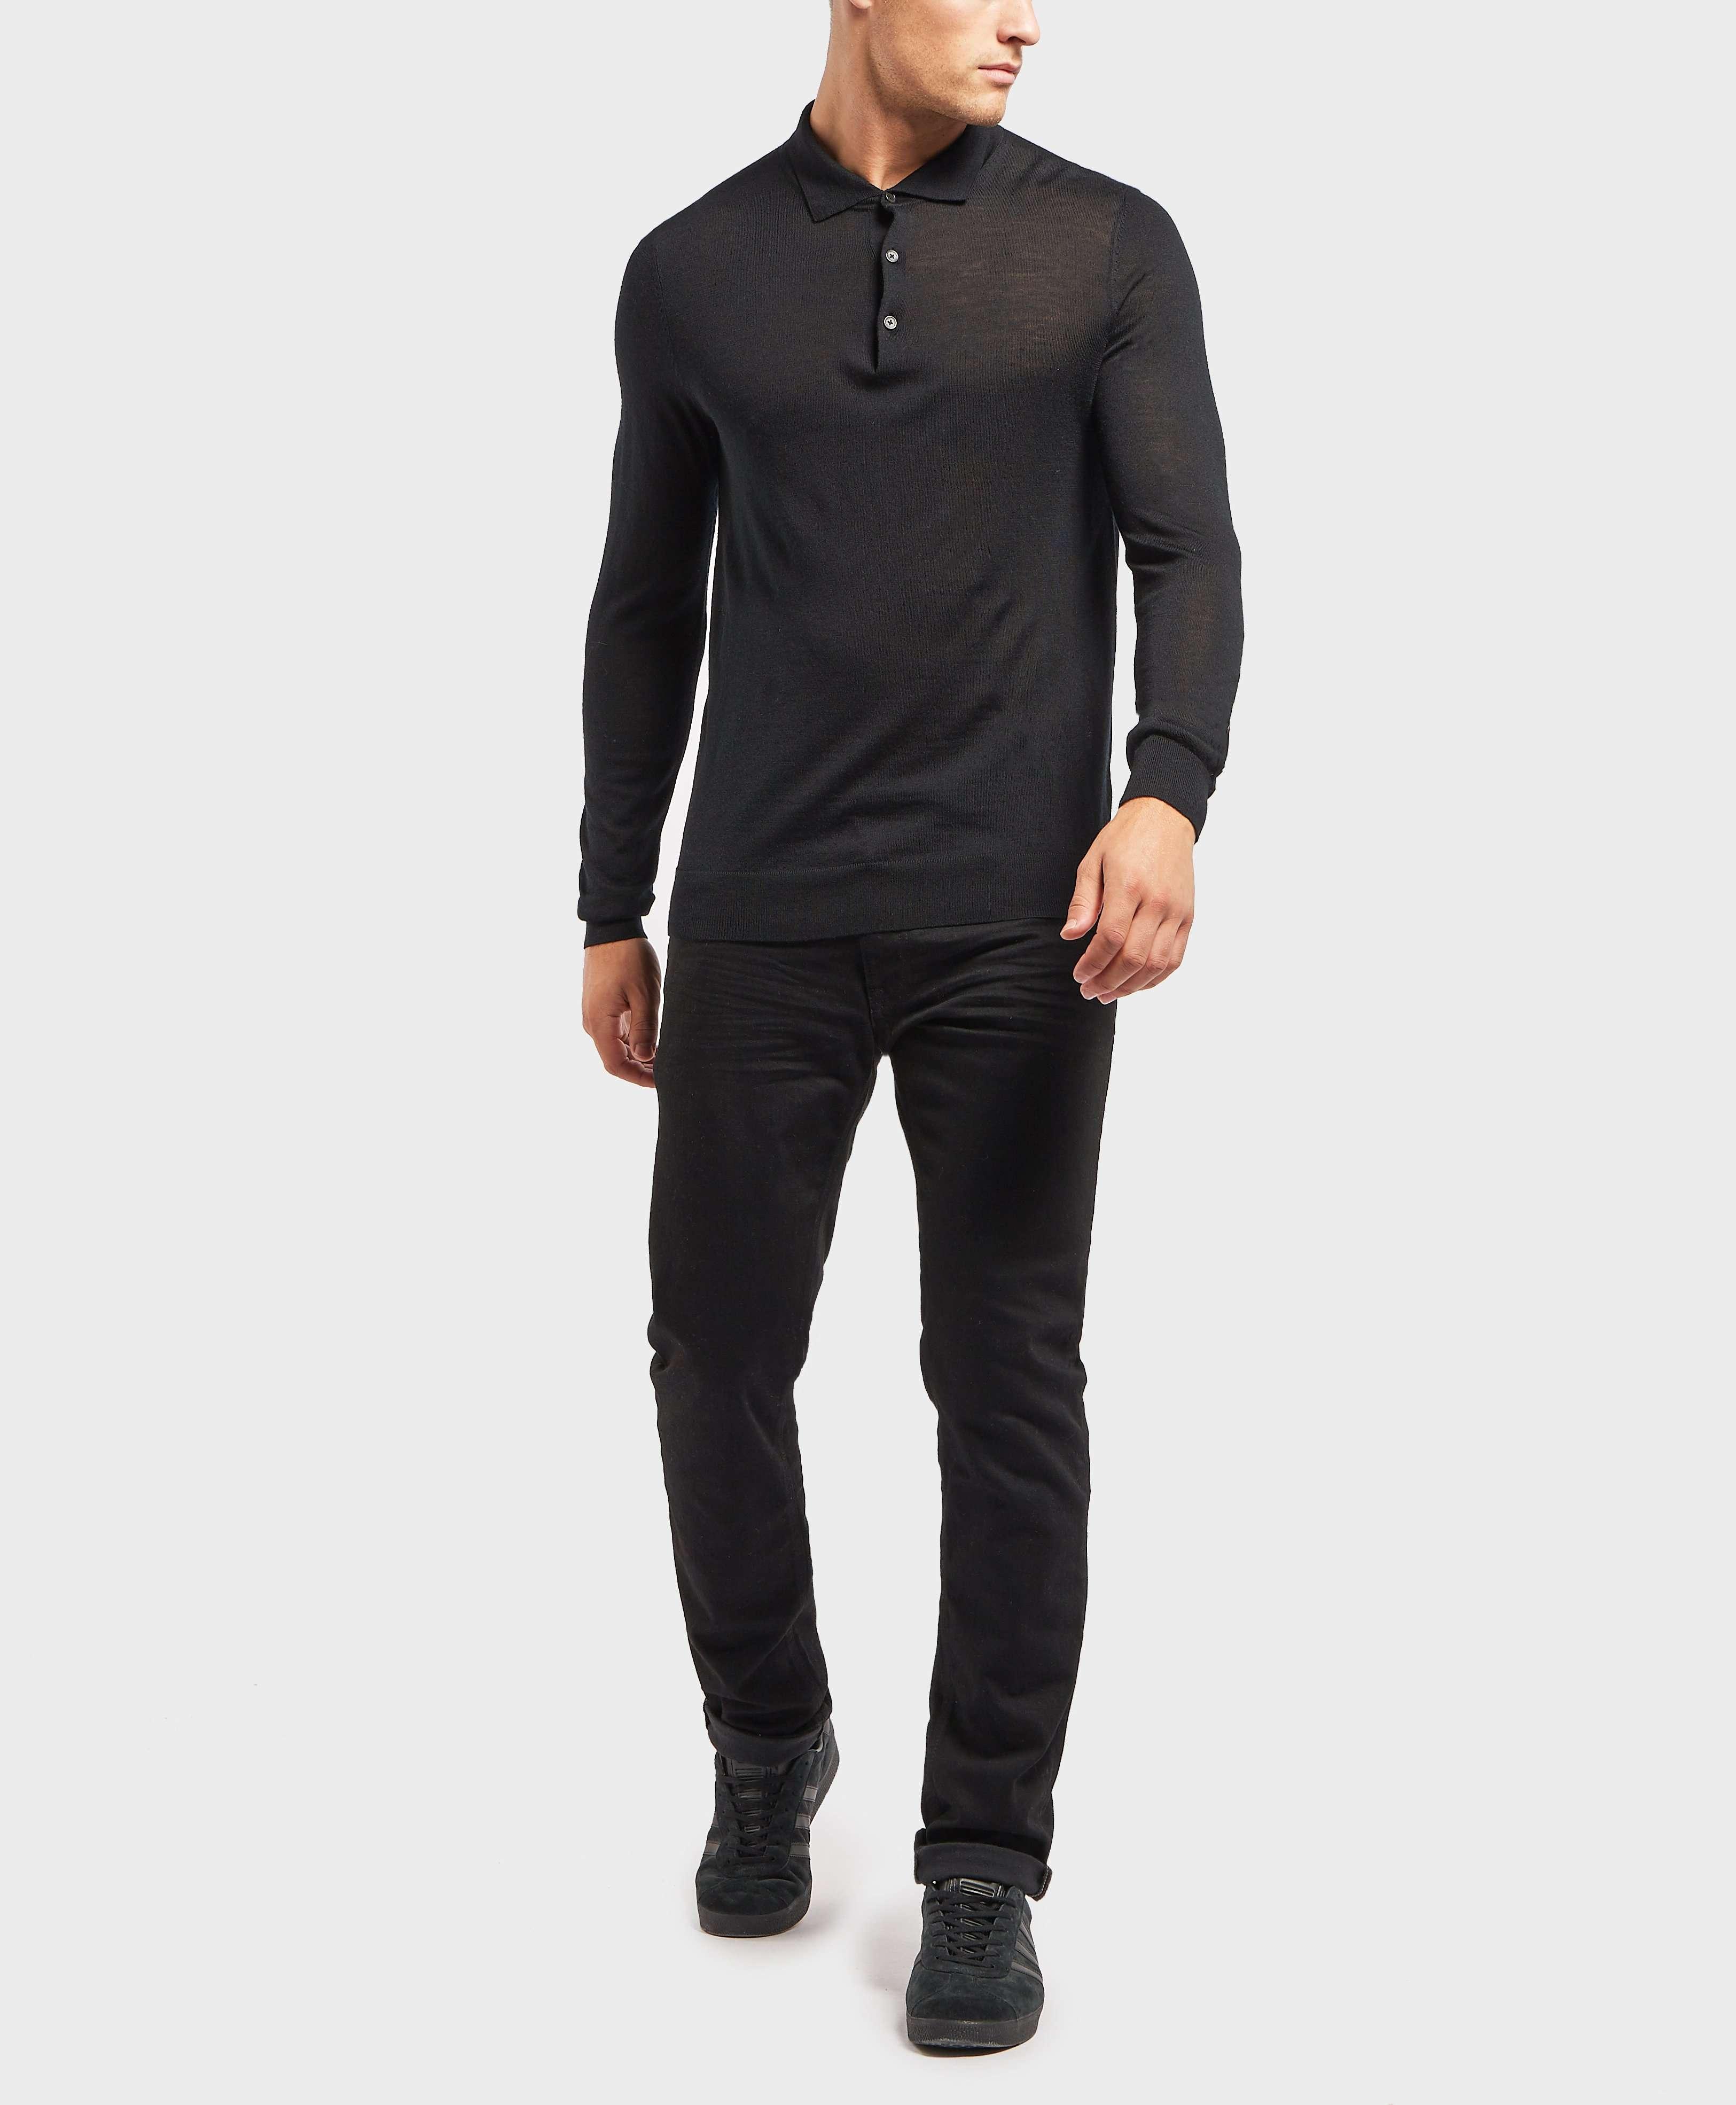 HUGO Knit Long Sleeve Polo Shirt